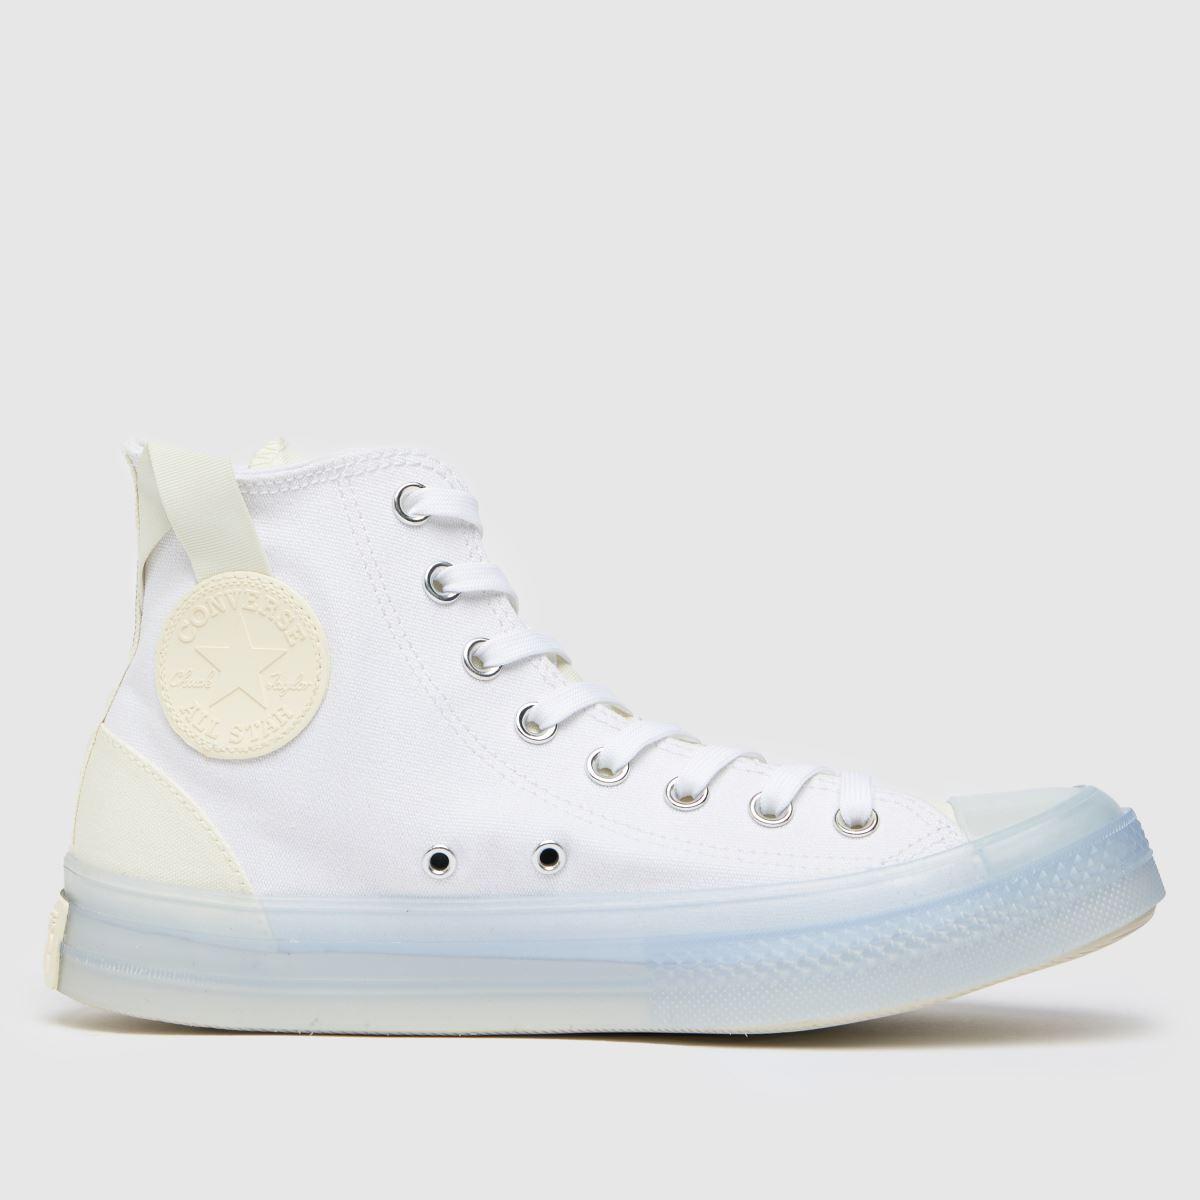 Converse White Cx Hi Trainers